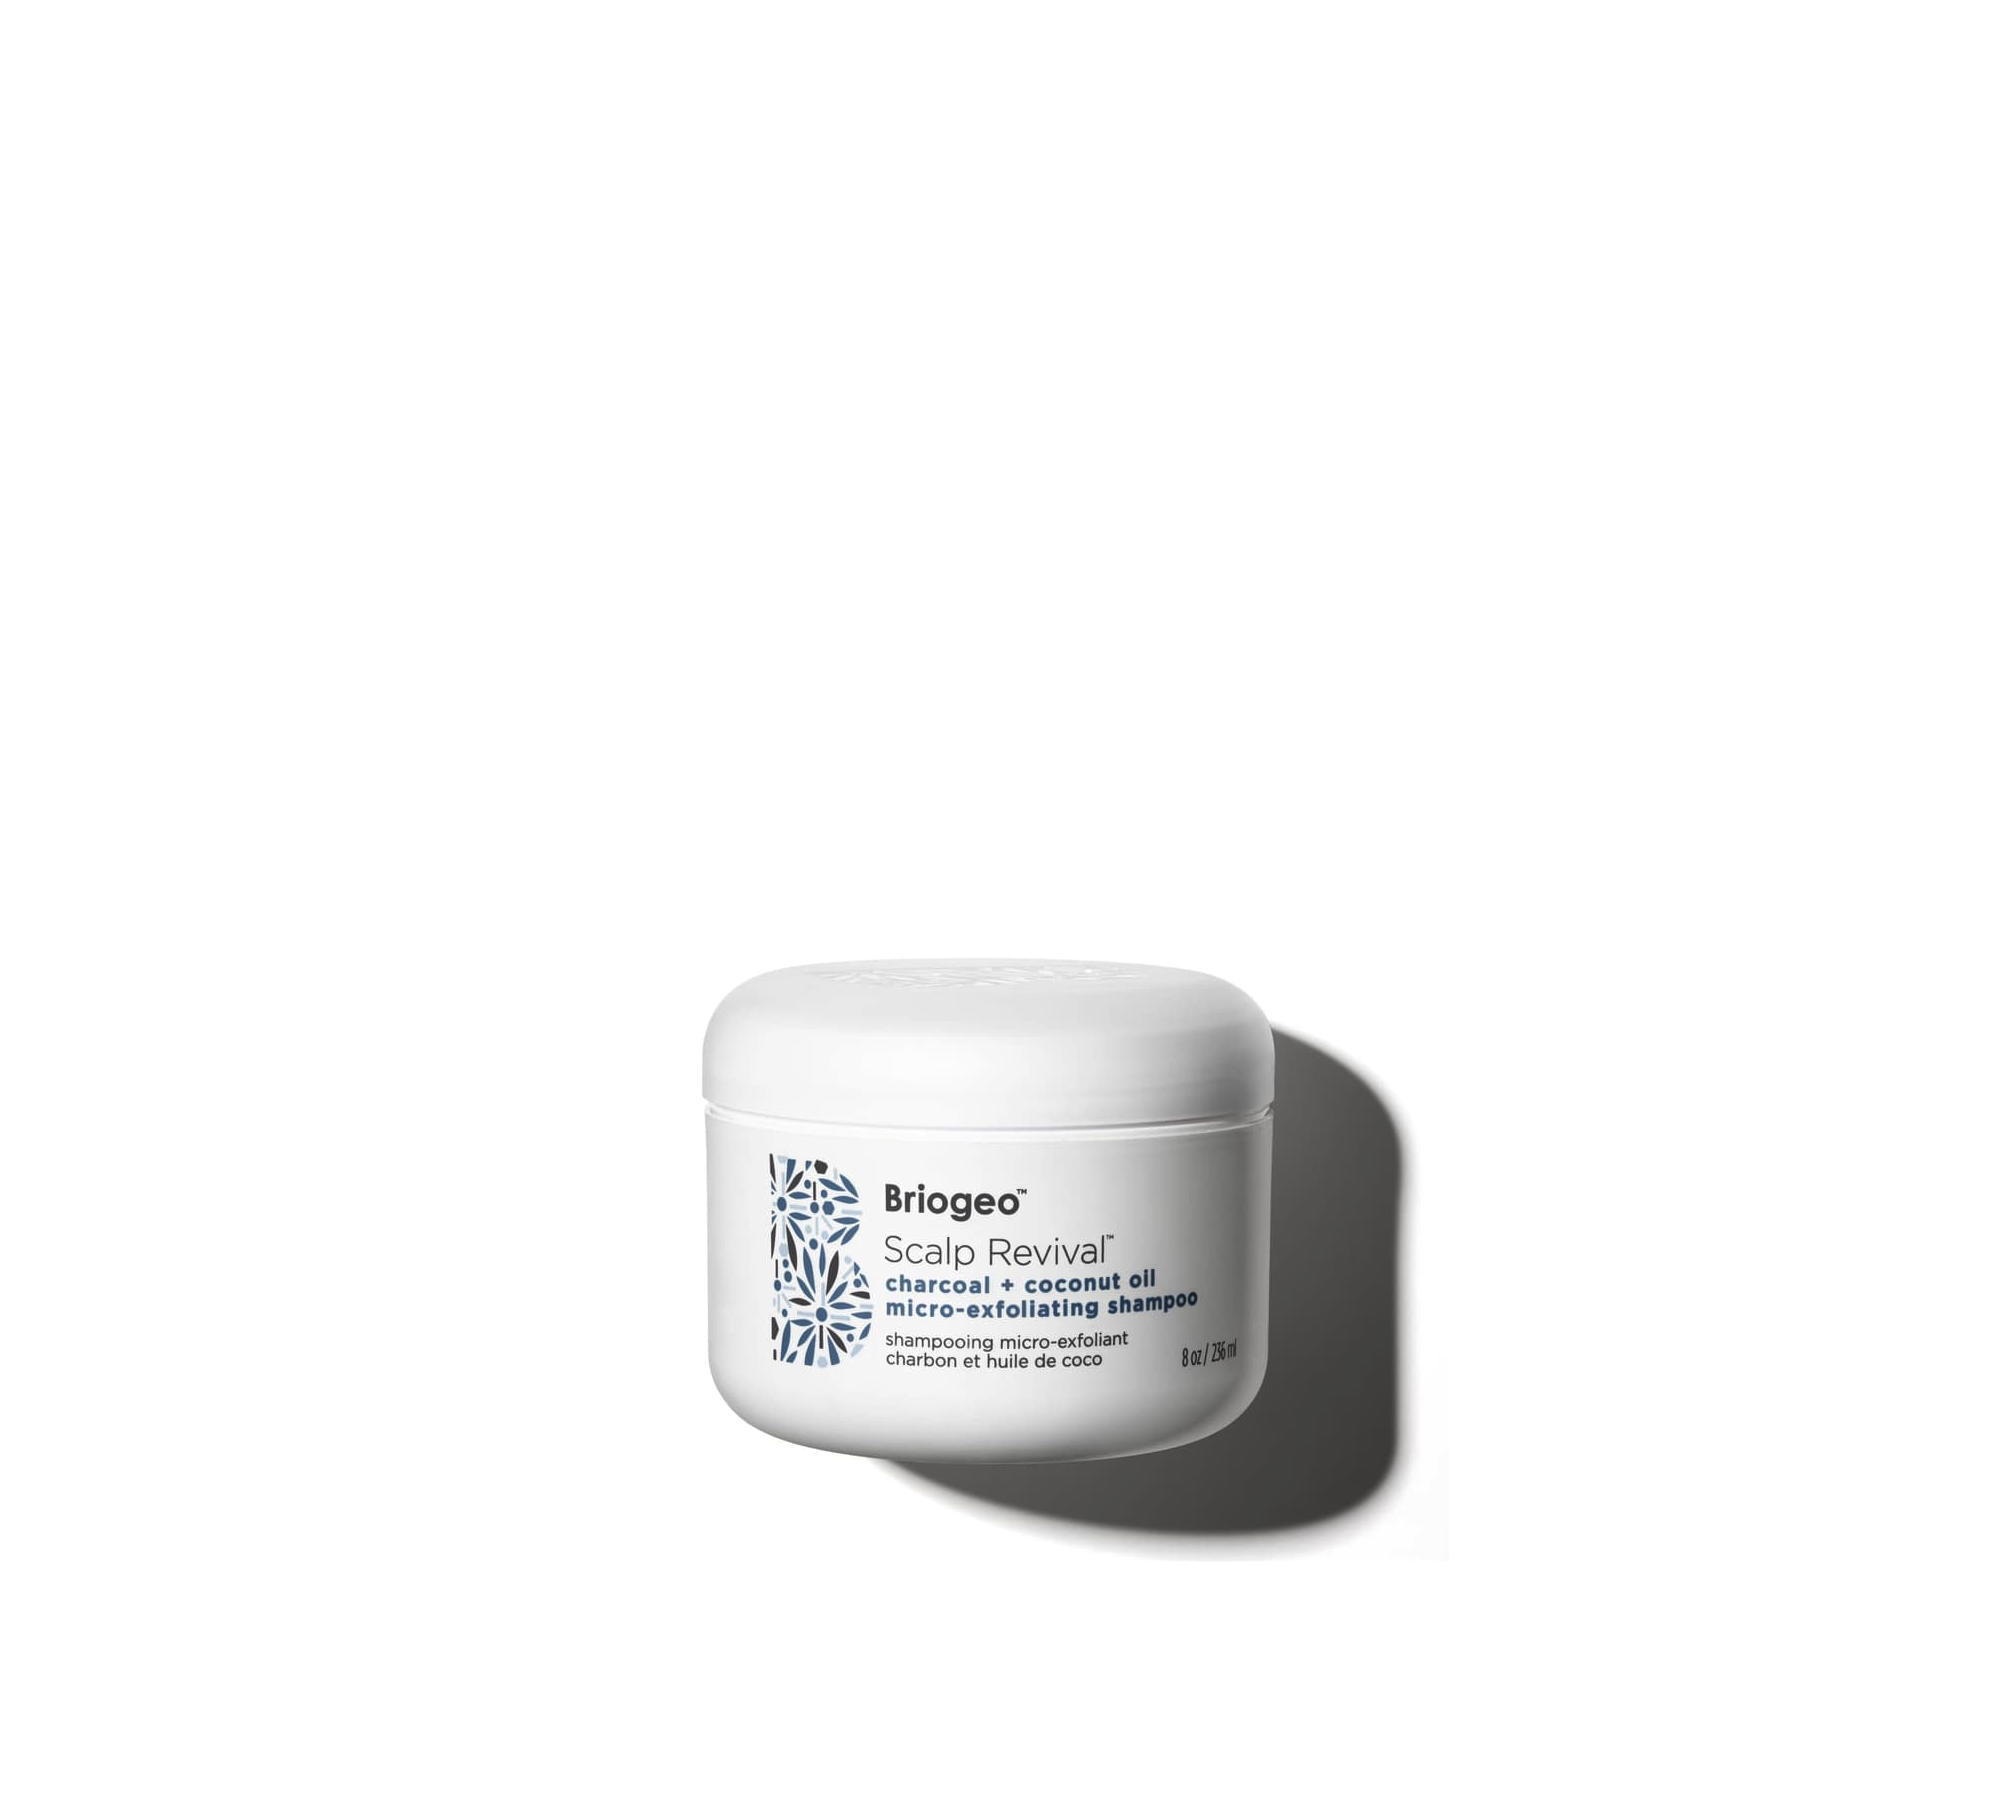 Scalp Revival Charcoal + Coconut Oil Micro-Exfoliating Shampoo BRIOGEO Price$42.00